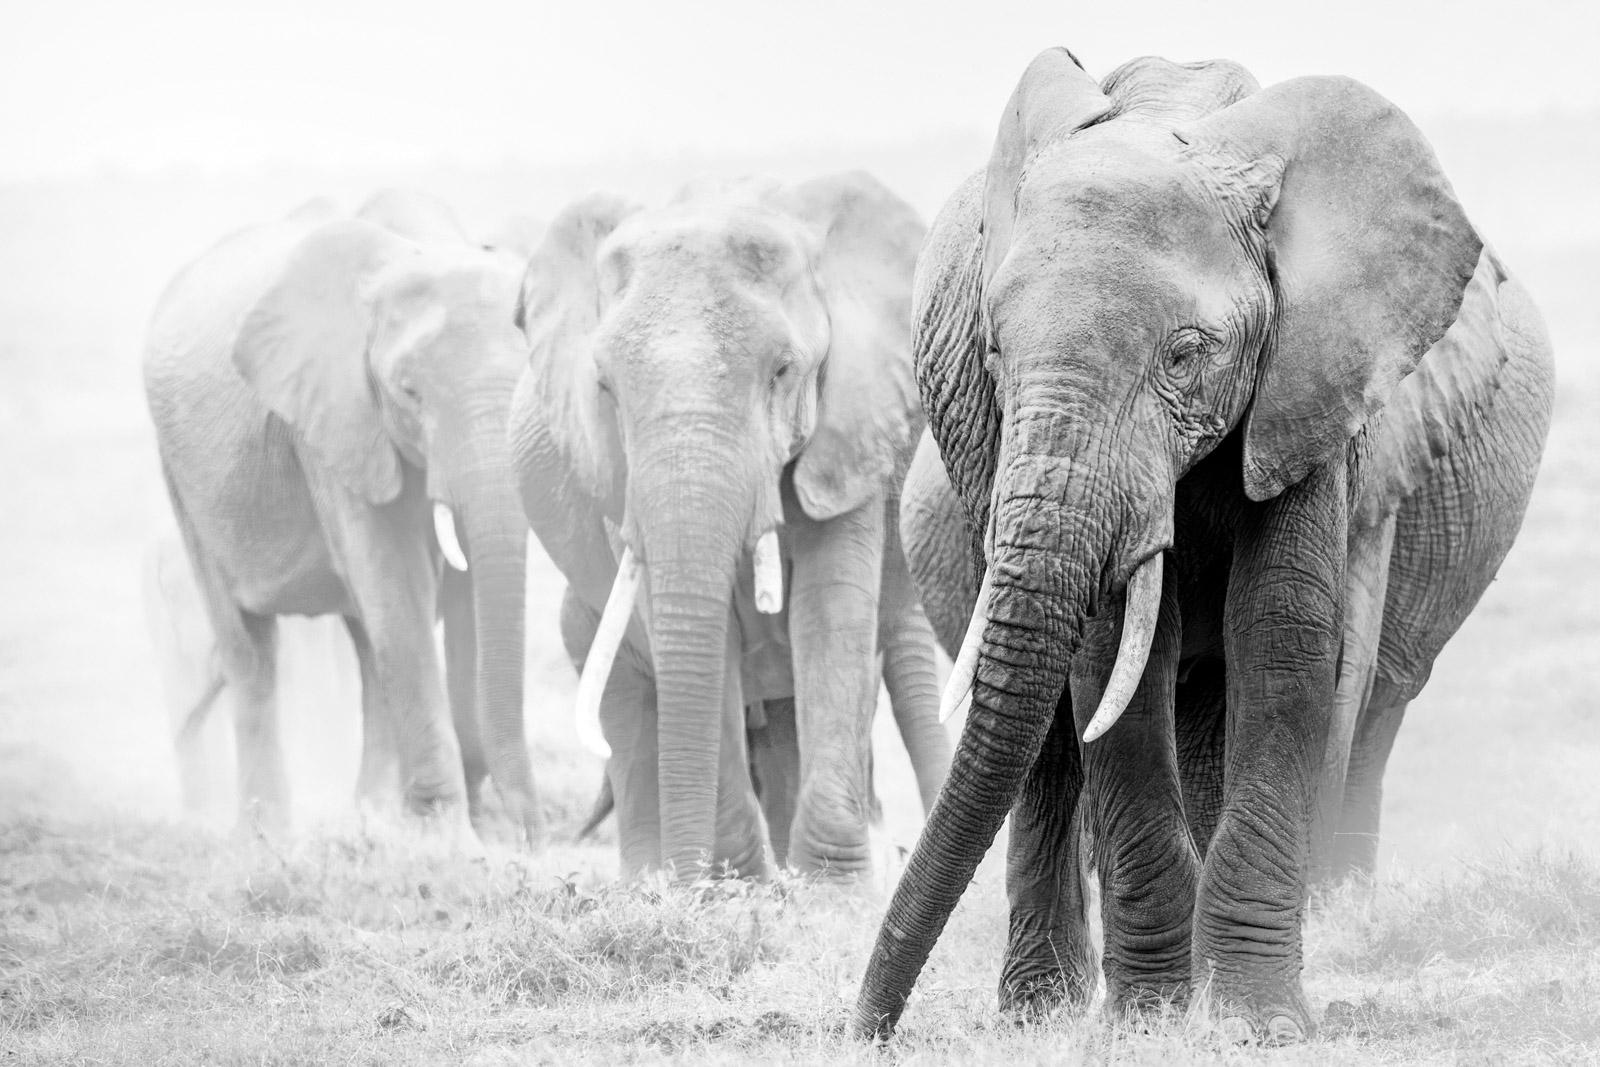 Over exposed elephants for a creative safari photo